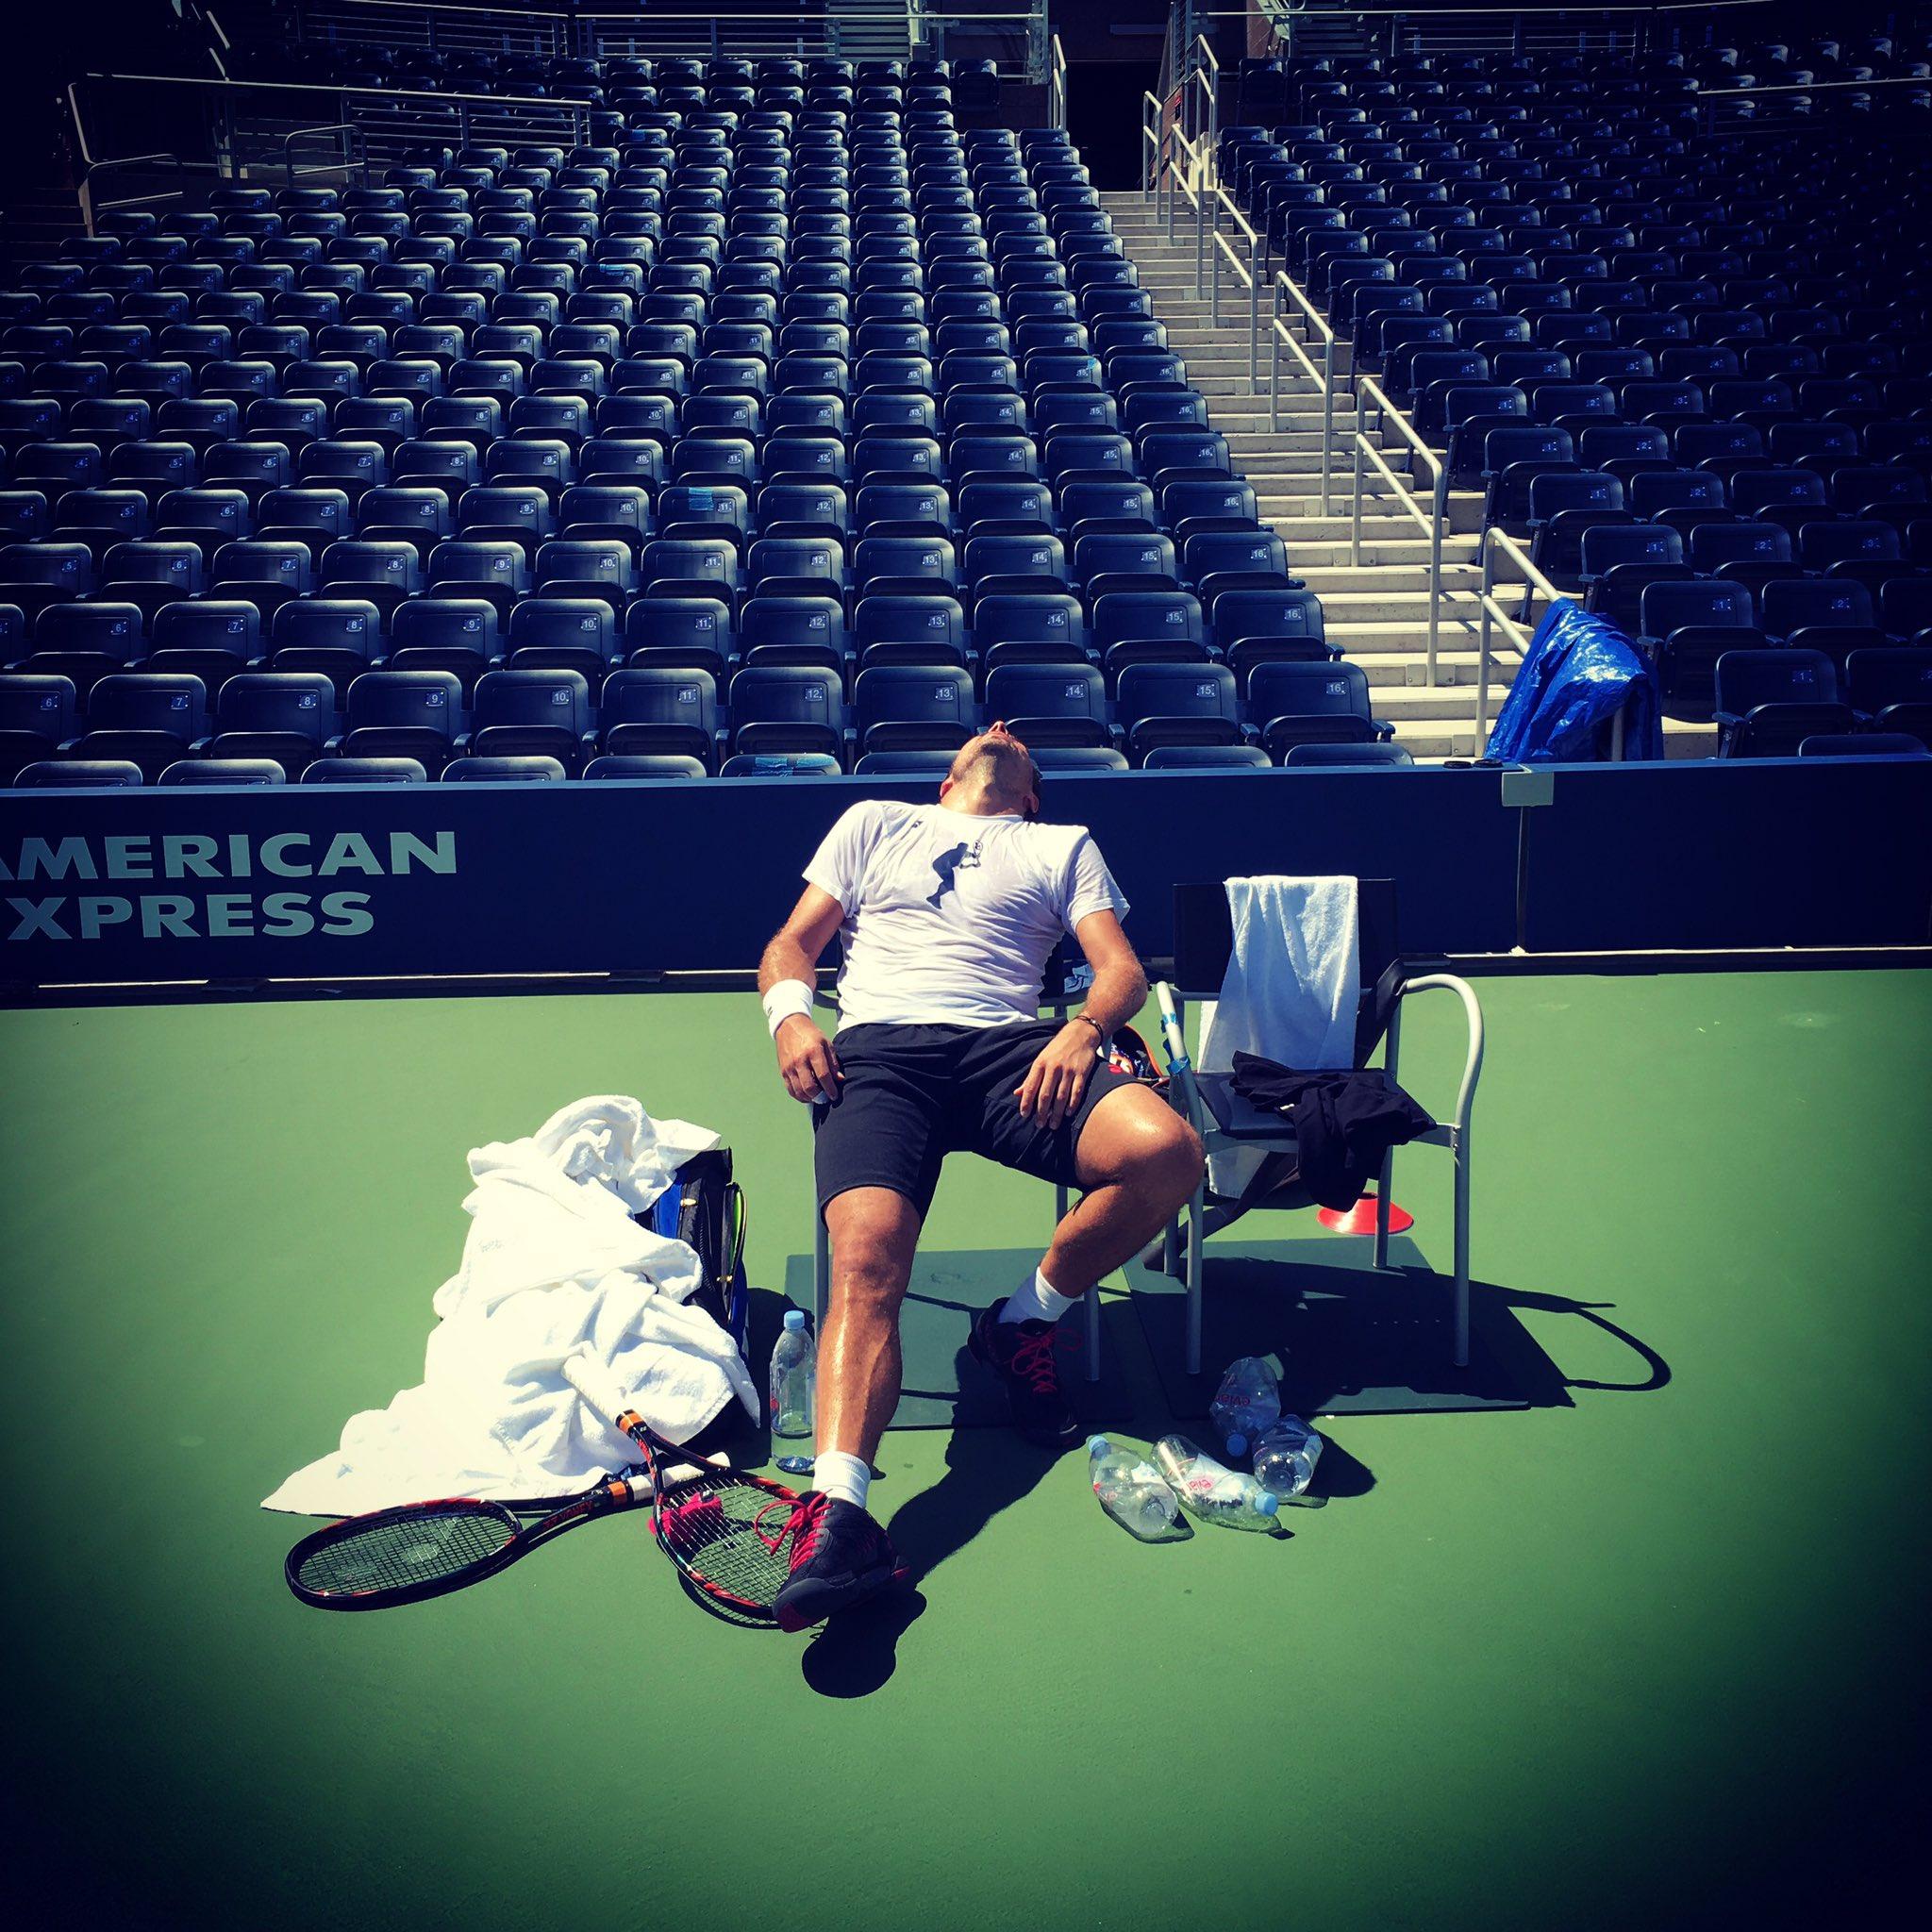 When you finish a practice like that...Normally your coach should be happy!@normansweden ?!゚ルト゚ᄂヤ゚メᆰ゚マᄏ゚リナ゚リモ゚ルプマᄏ゚マテ゚マᄏ¬リタᄌマ゚ヤᆬ゚メᆬ゚メᆭ゚マピマᄏ゚ホᄒ゚レᄄ゚レム゚レ゚ラᄑ゚フト゚リリ゚ミᄐ https://t.co/fmAv4pSbX0